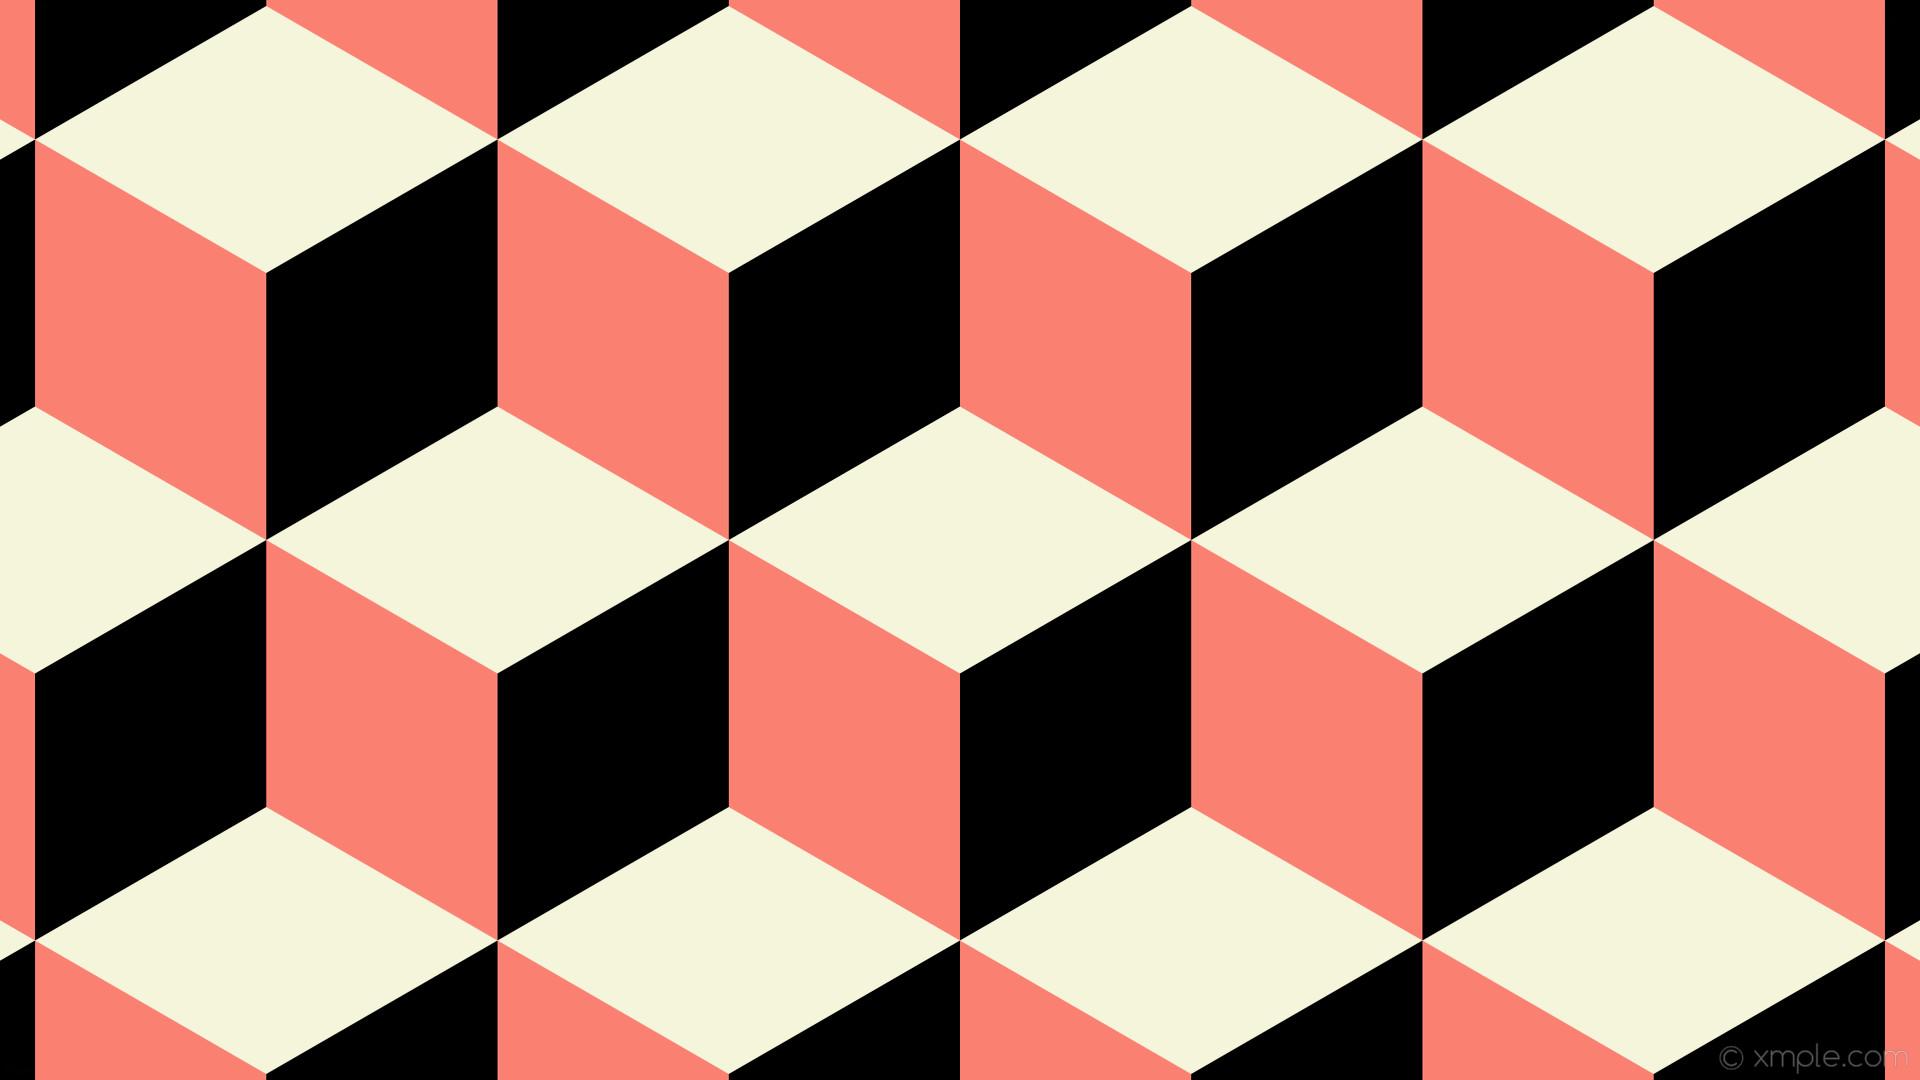 wallpaper white black 3d cubes red beige salmon #f5f5dc #fa8072 #000000 180°